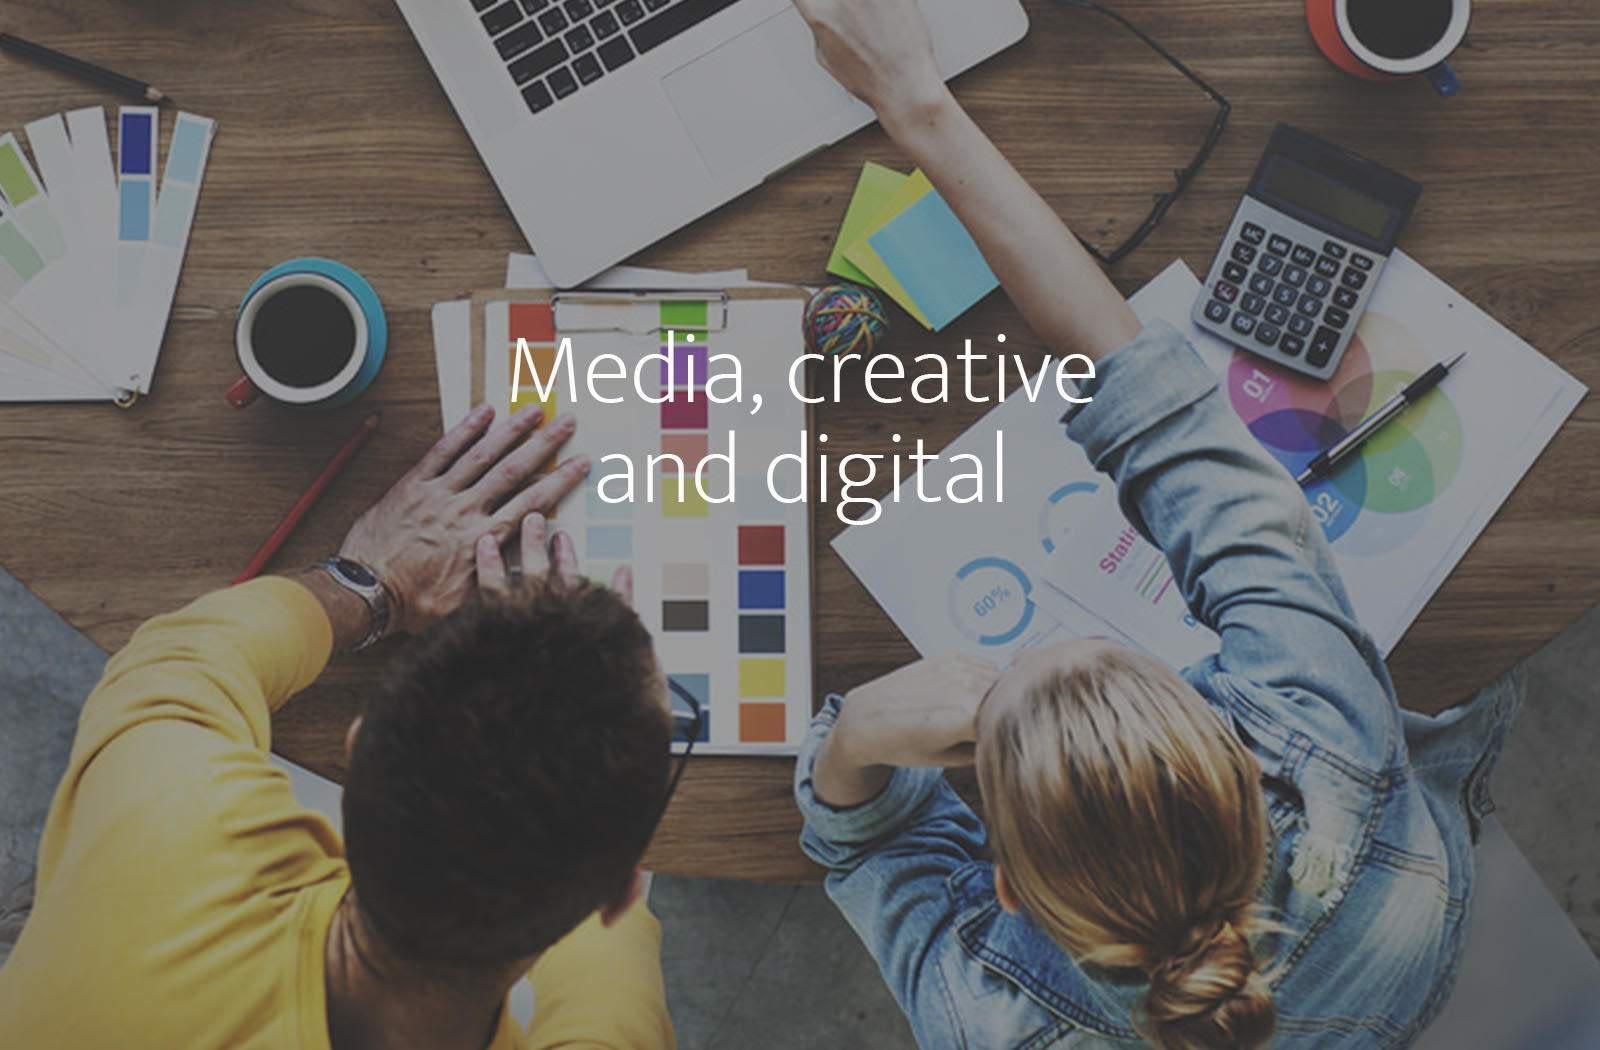 Recruitment, assessment & development for media, creative and digital sectors